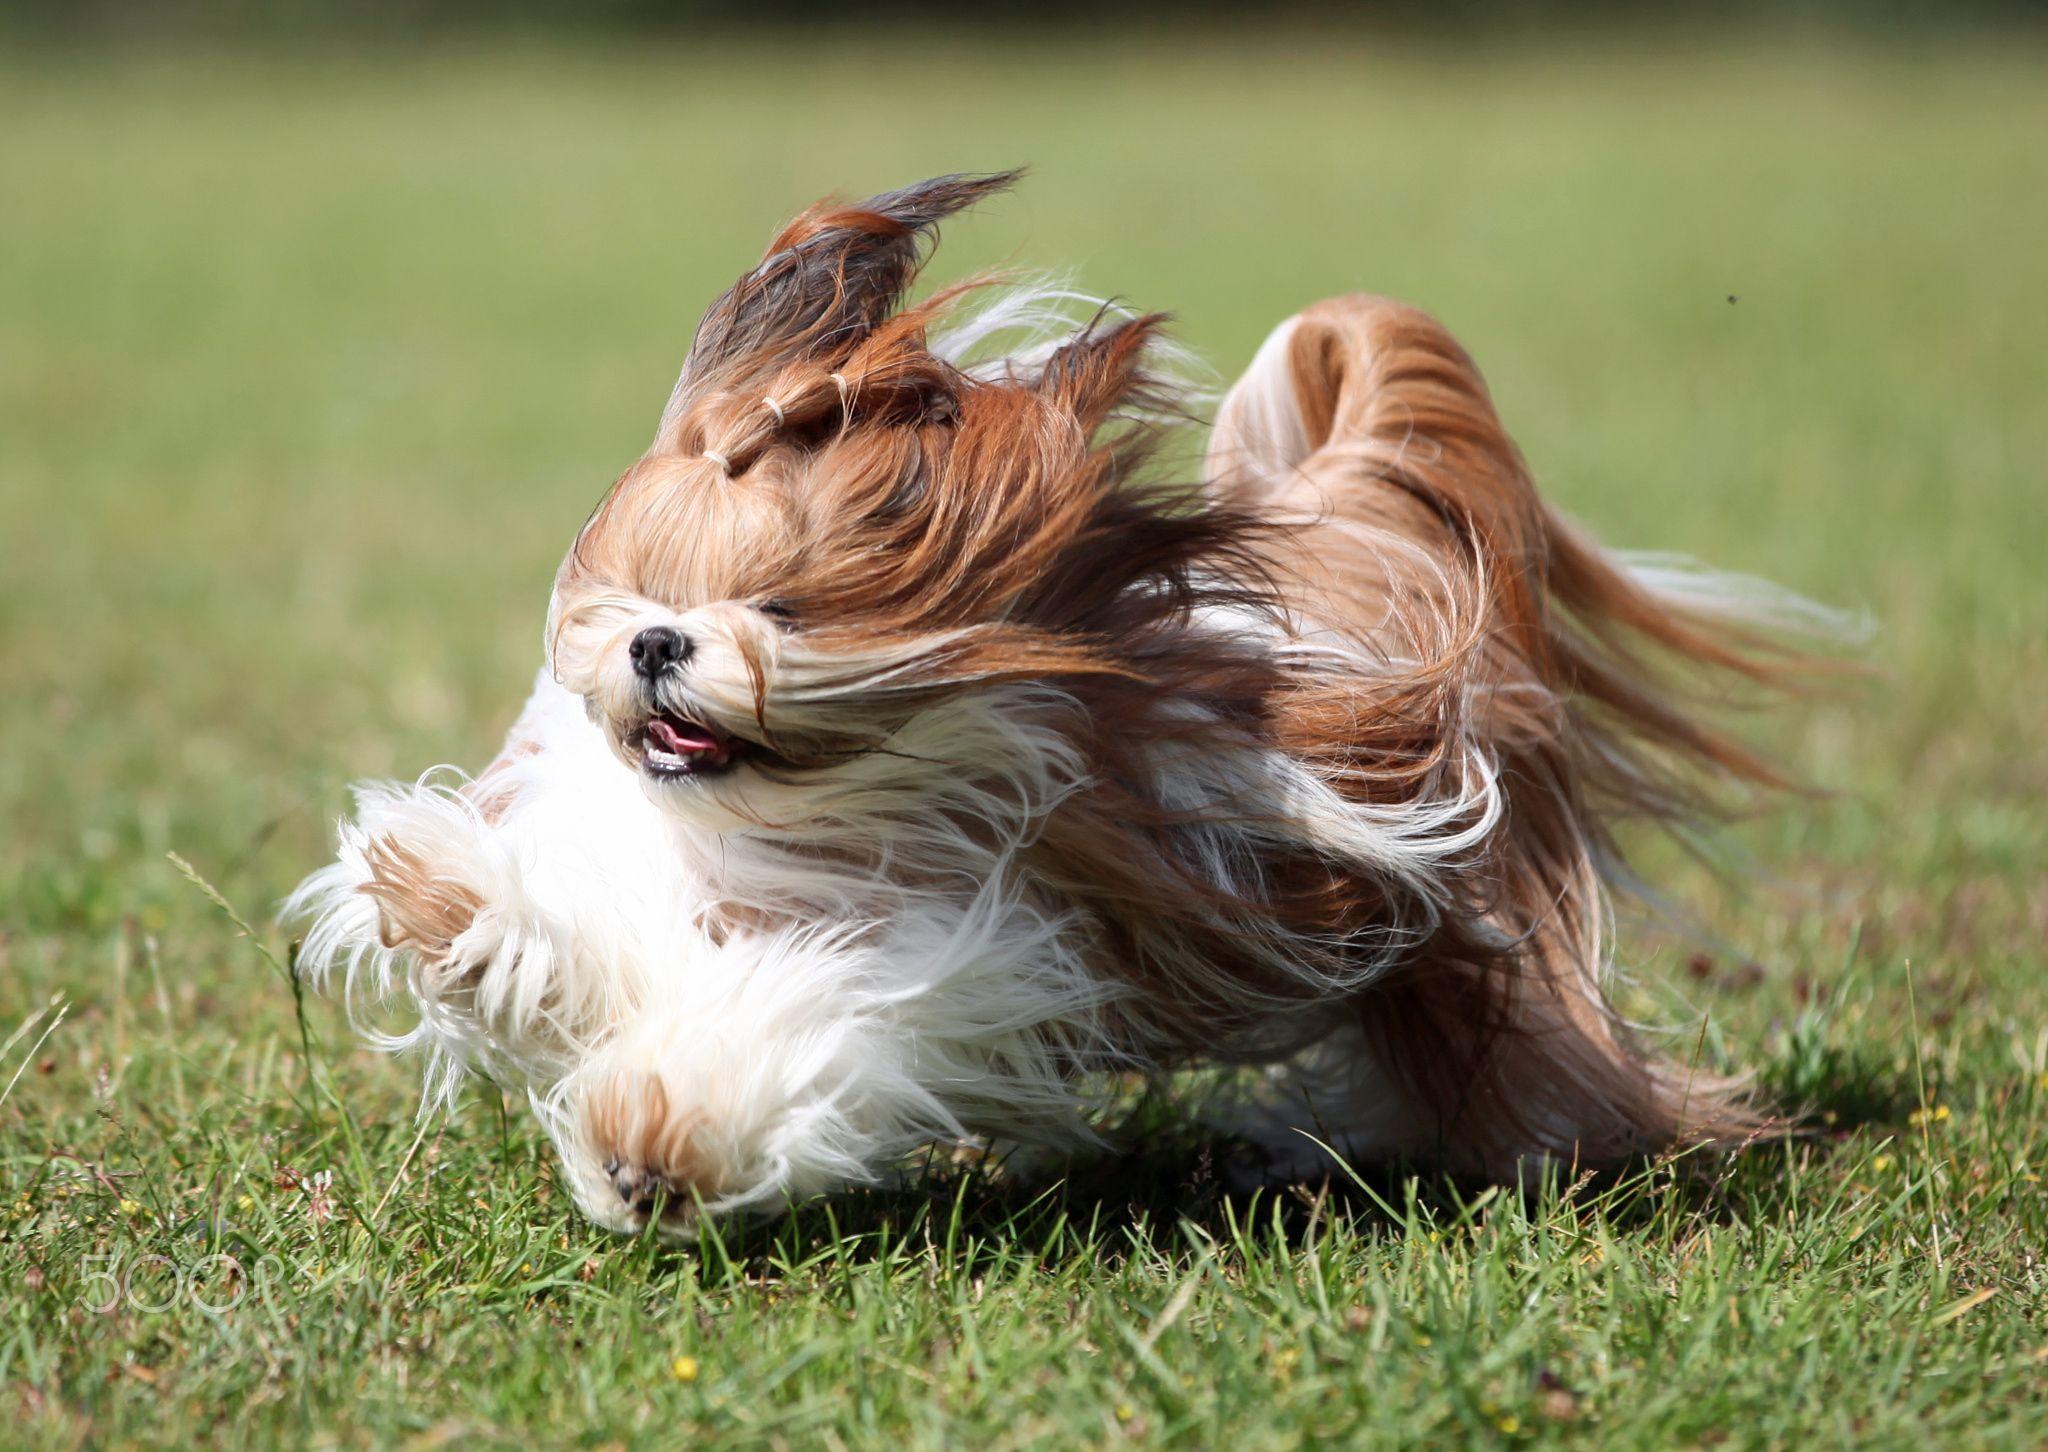 Shih Tzu Long Haired Shih Tzu Running On Grass Shih Tzu Dogs Animals